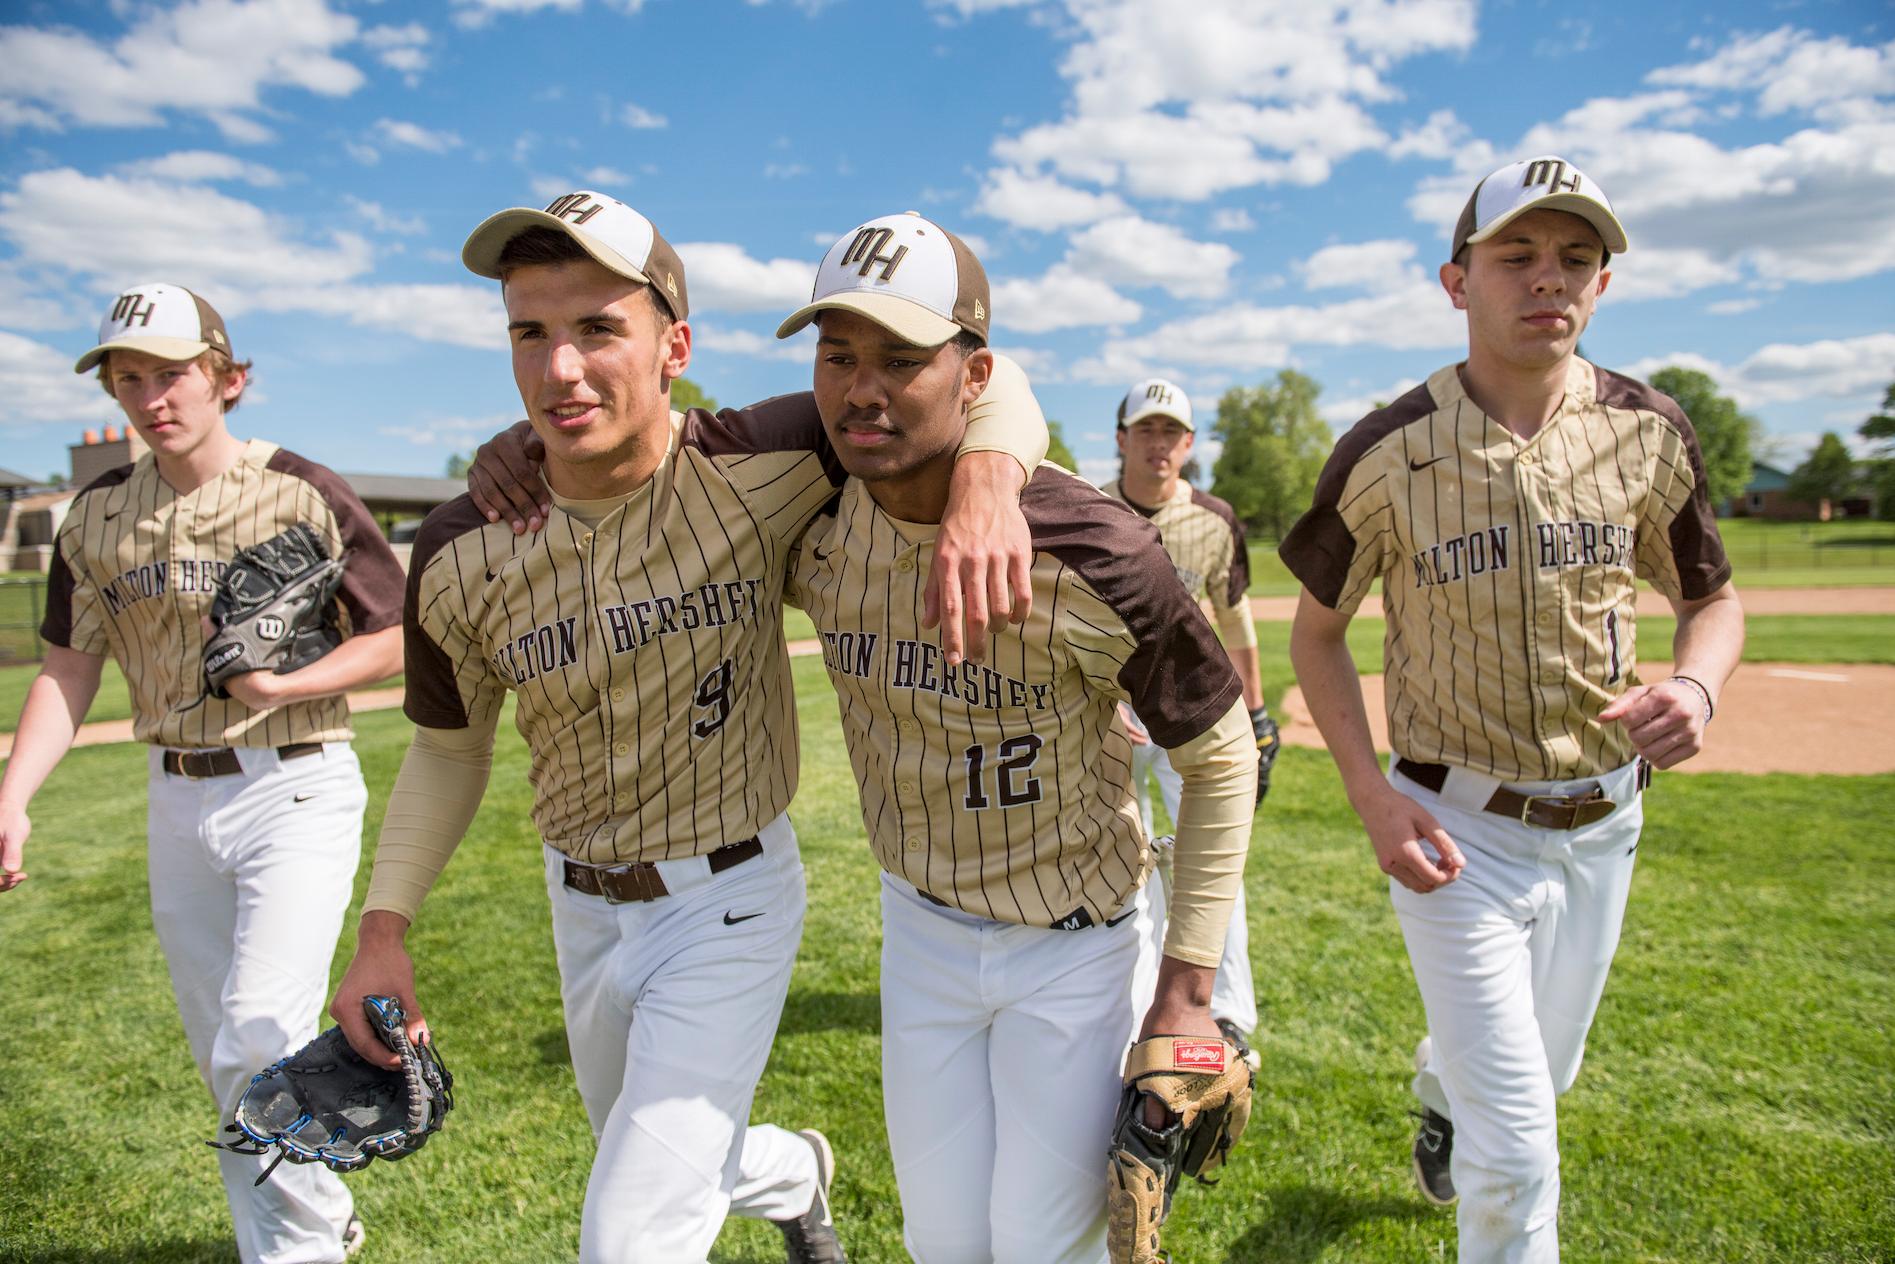 Student baseball team